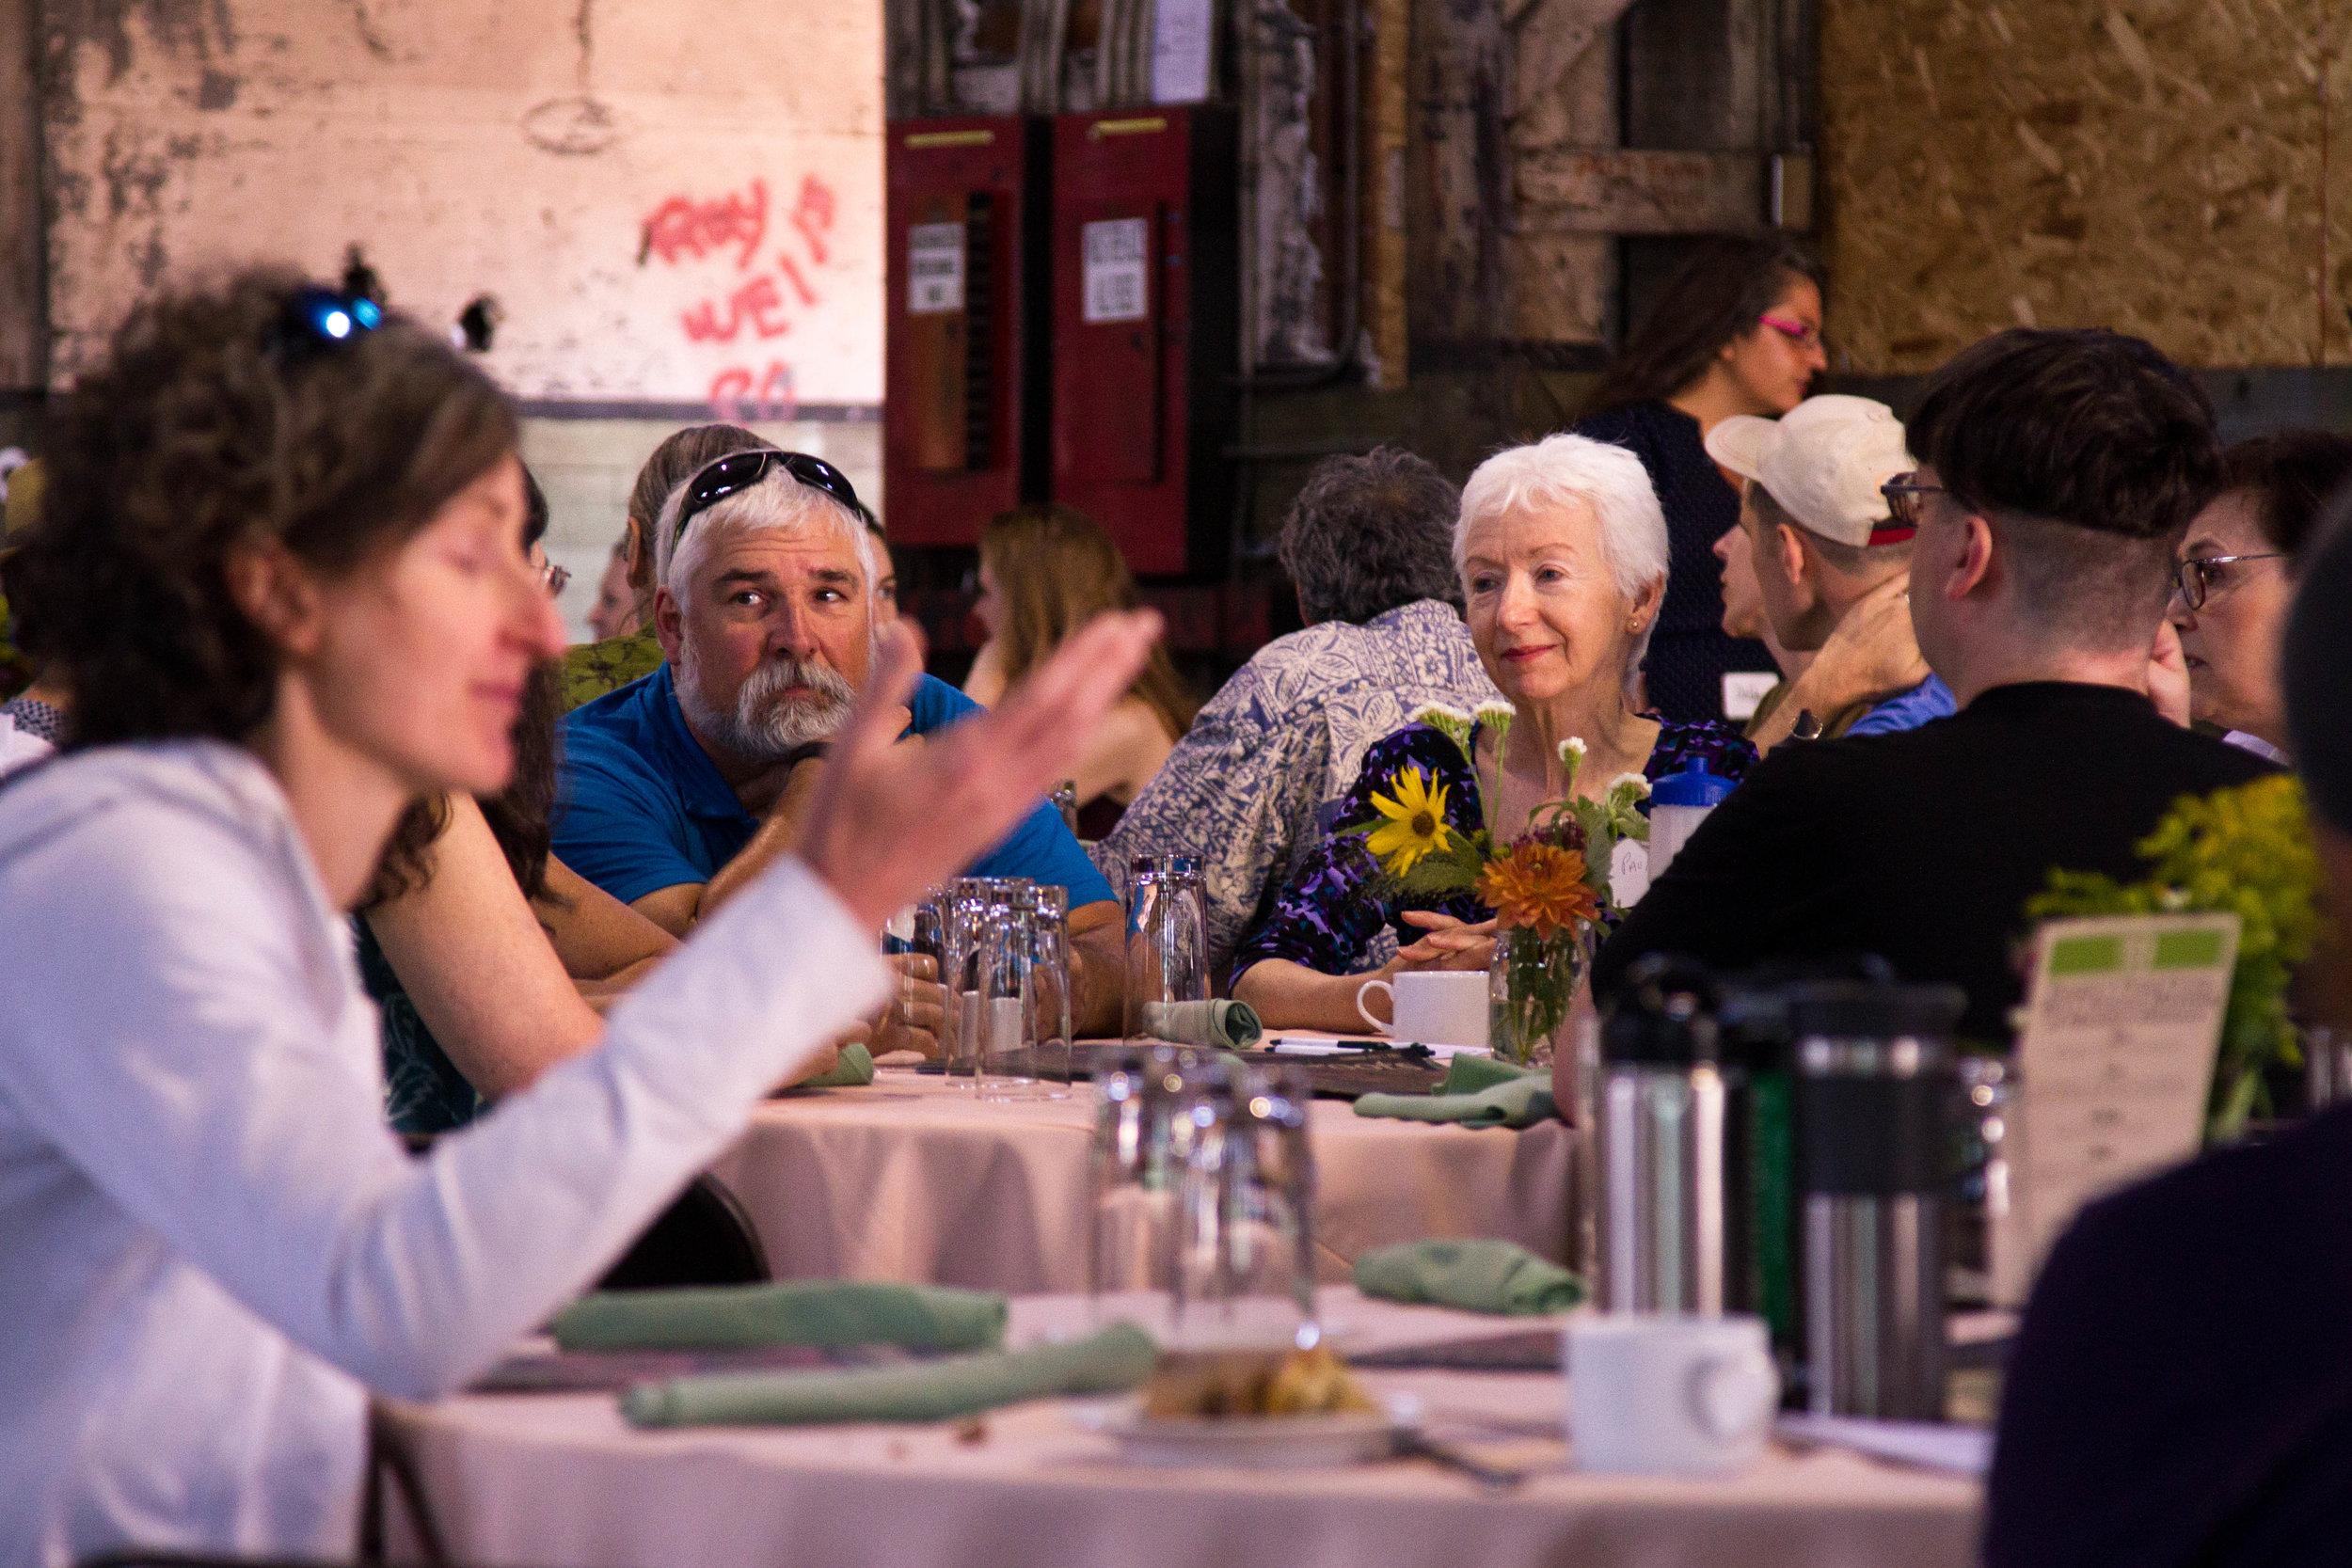 _MG_2313_Peoples Food Co-op Annual Meeting 2017_Photographer Soraya Majd.jpg